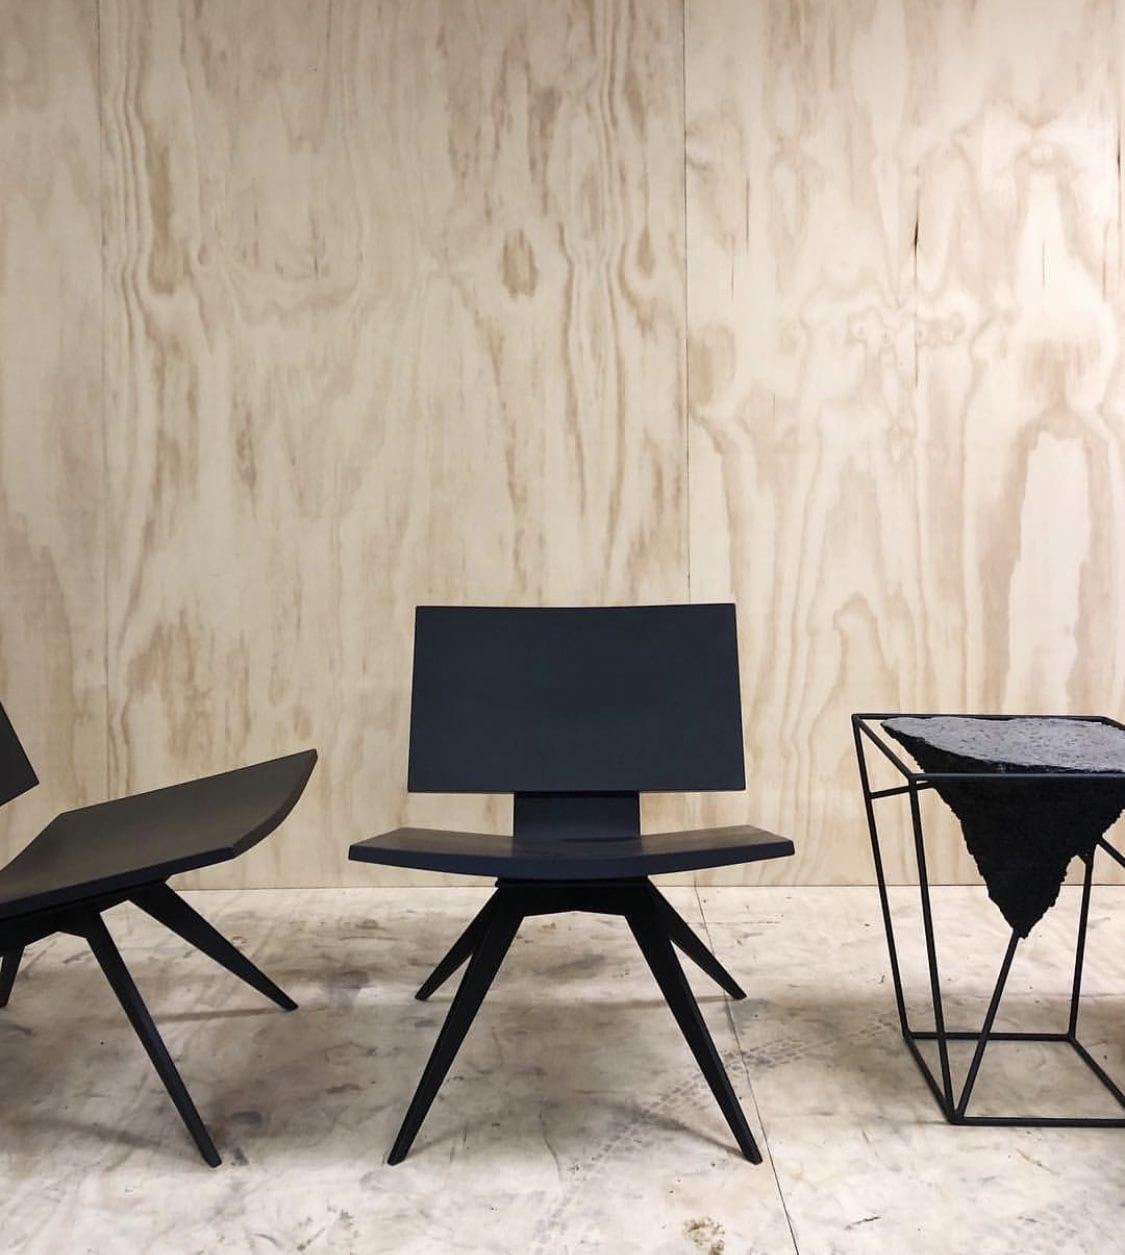 Chairs by Concrete Pig seen at Veronique Wantz Gallery, Minneapolis - D'Abri | Lounge